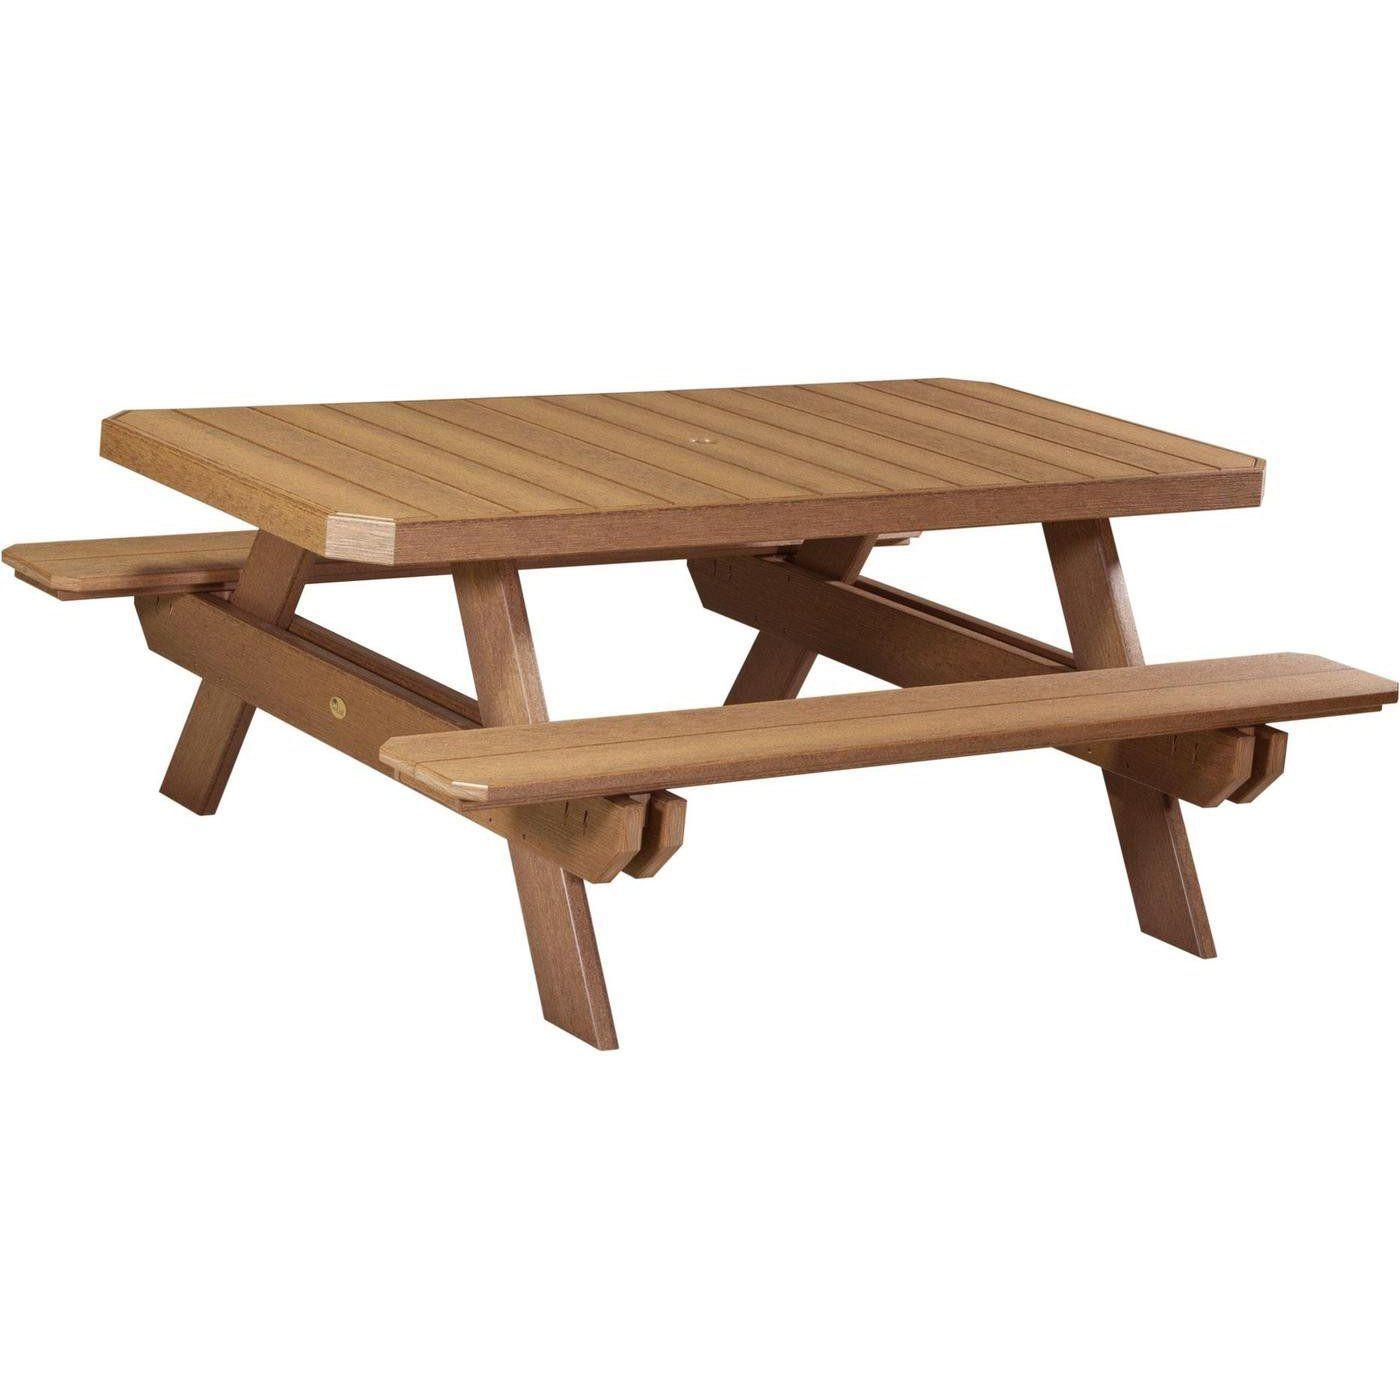 LuxCraft Recycled Plastic Rectangular Picnic Table Woodworking - Recycled plastic octagon picnic table